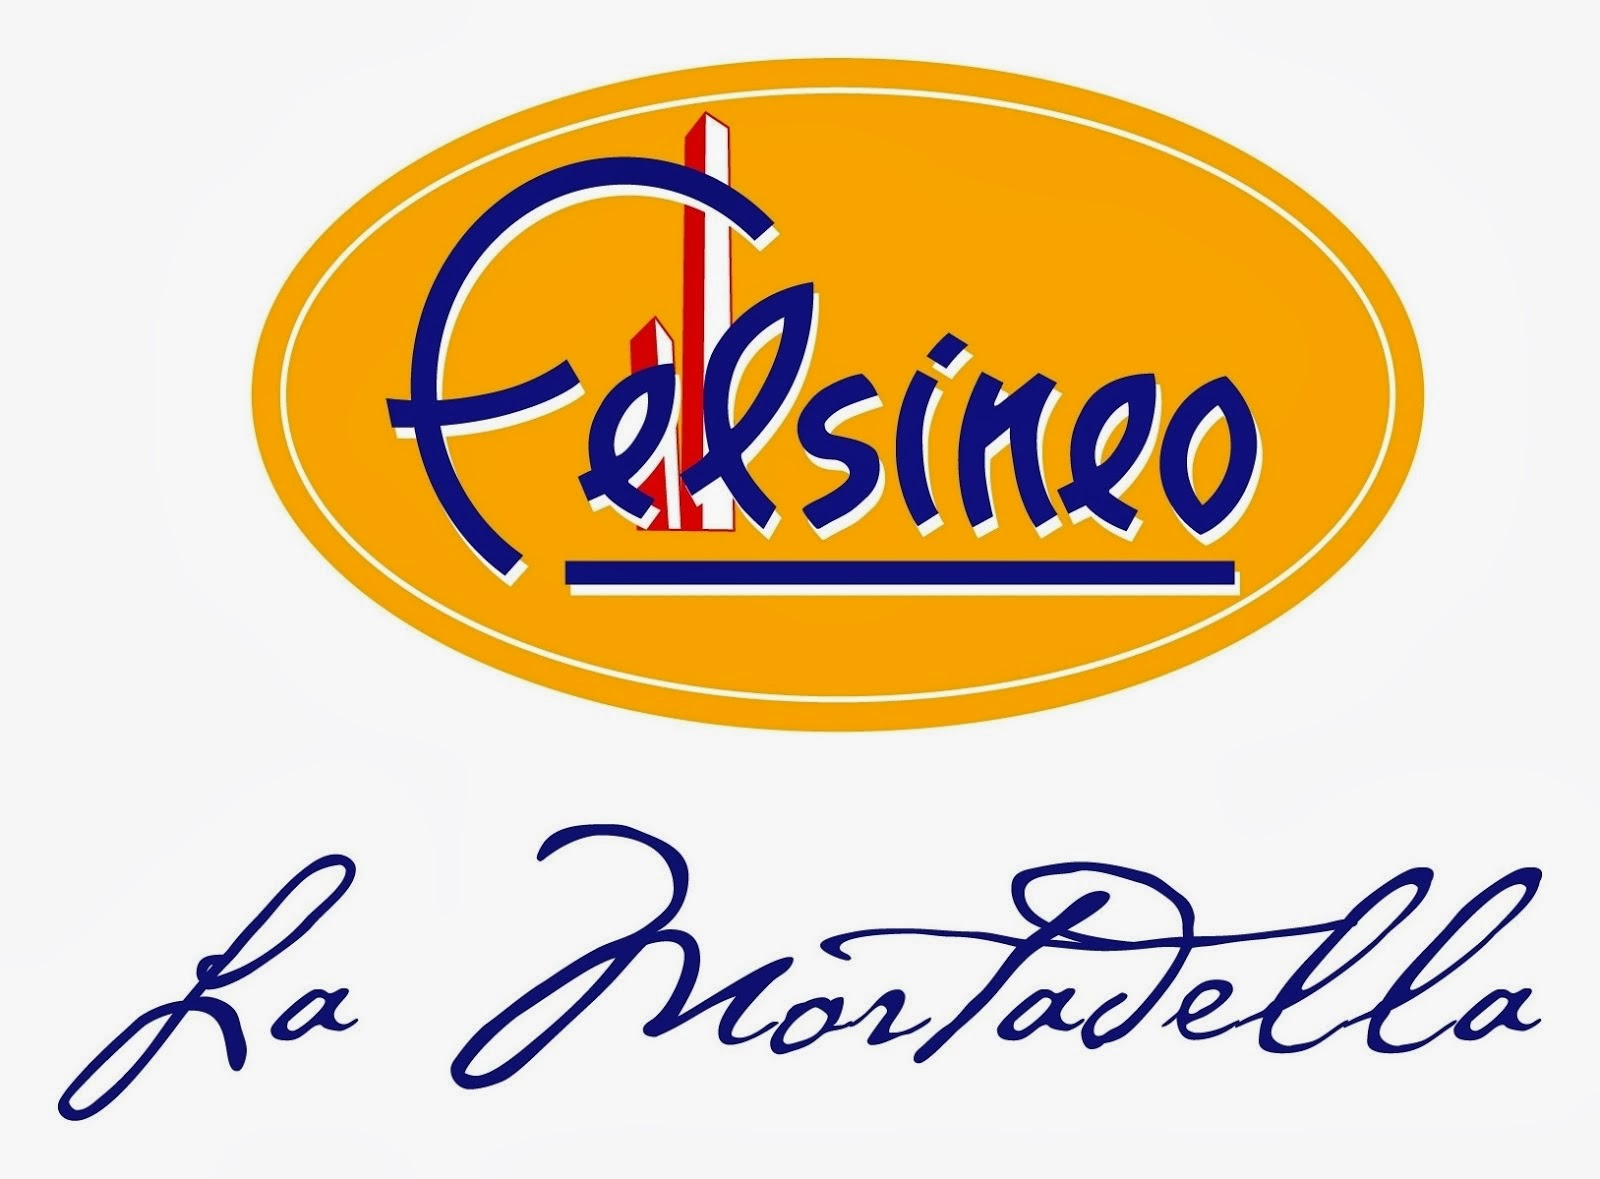 http://www.felsineo.com/